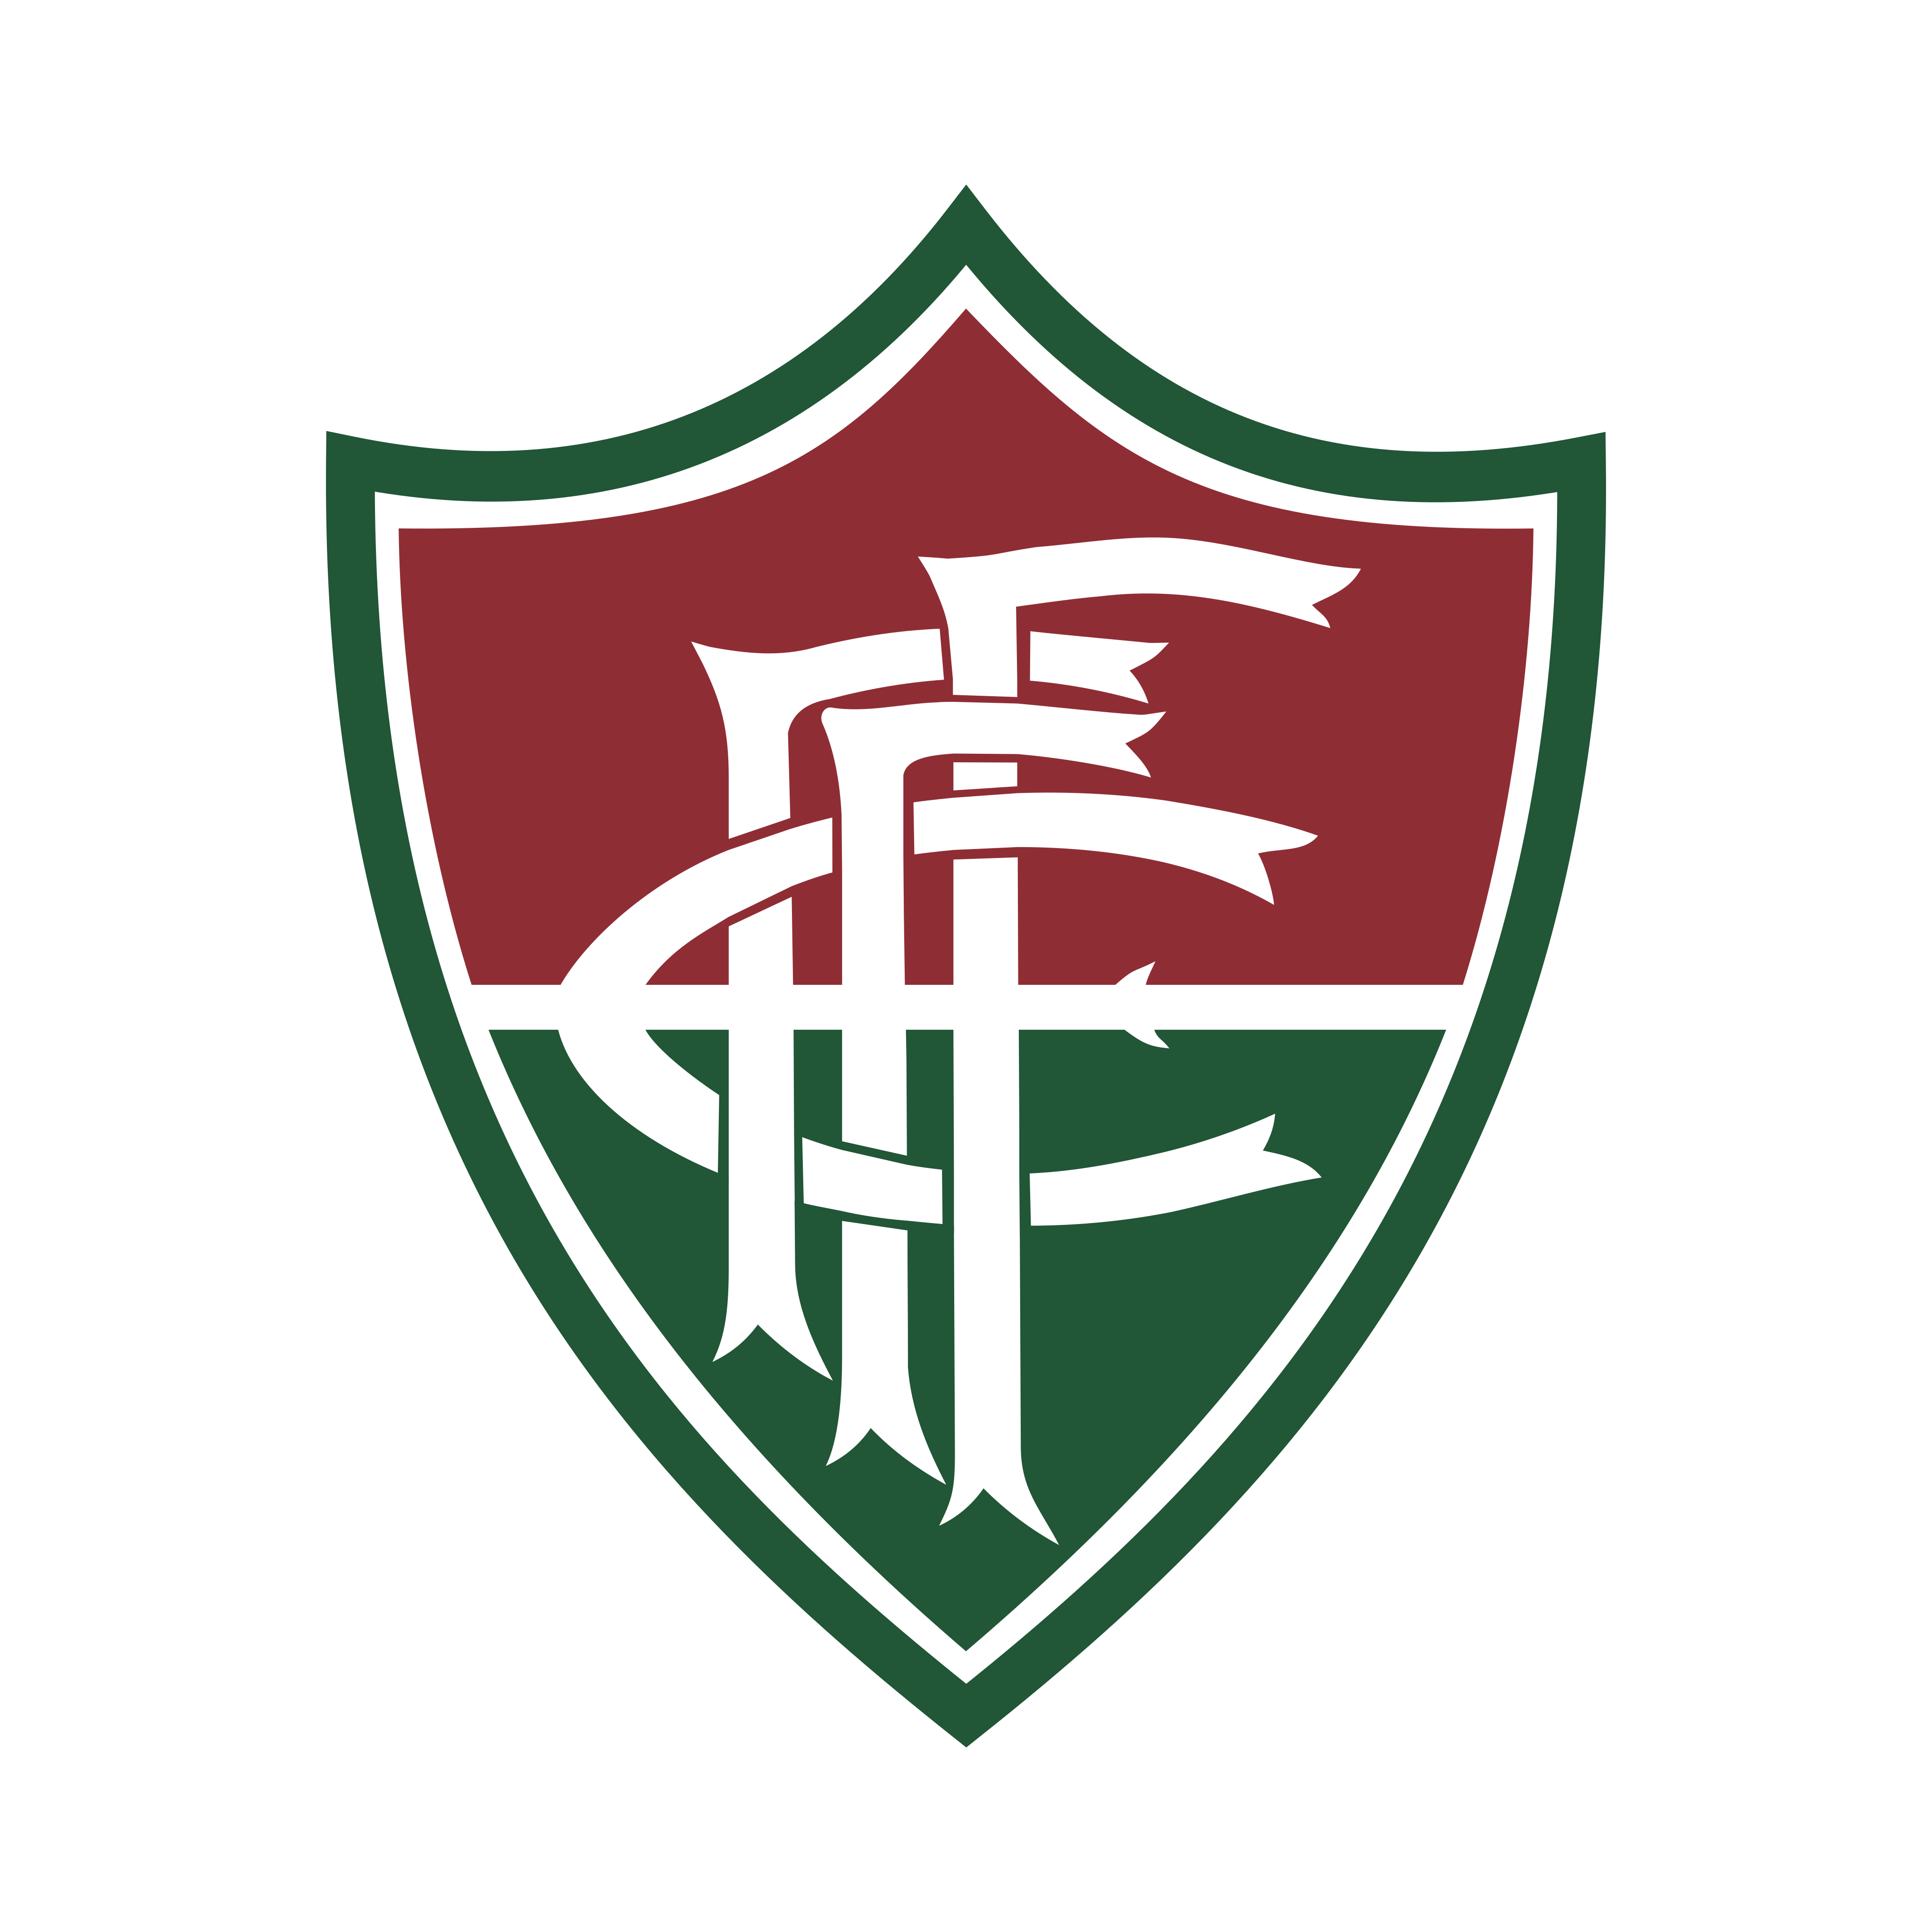 fluminense de feira logo 0 - Fluminense de Feira FC Logo